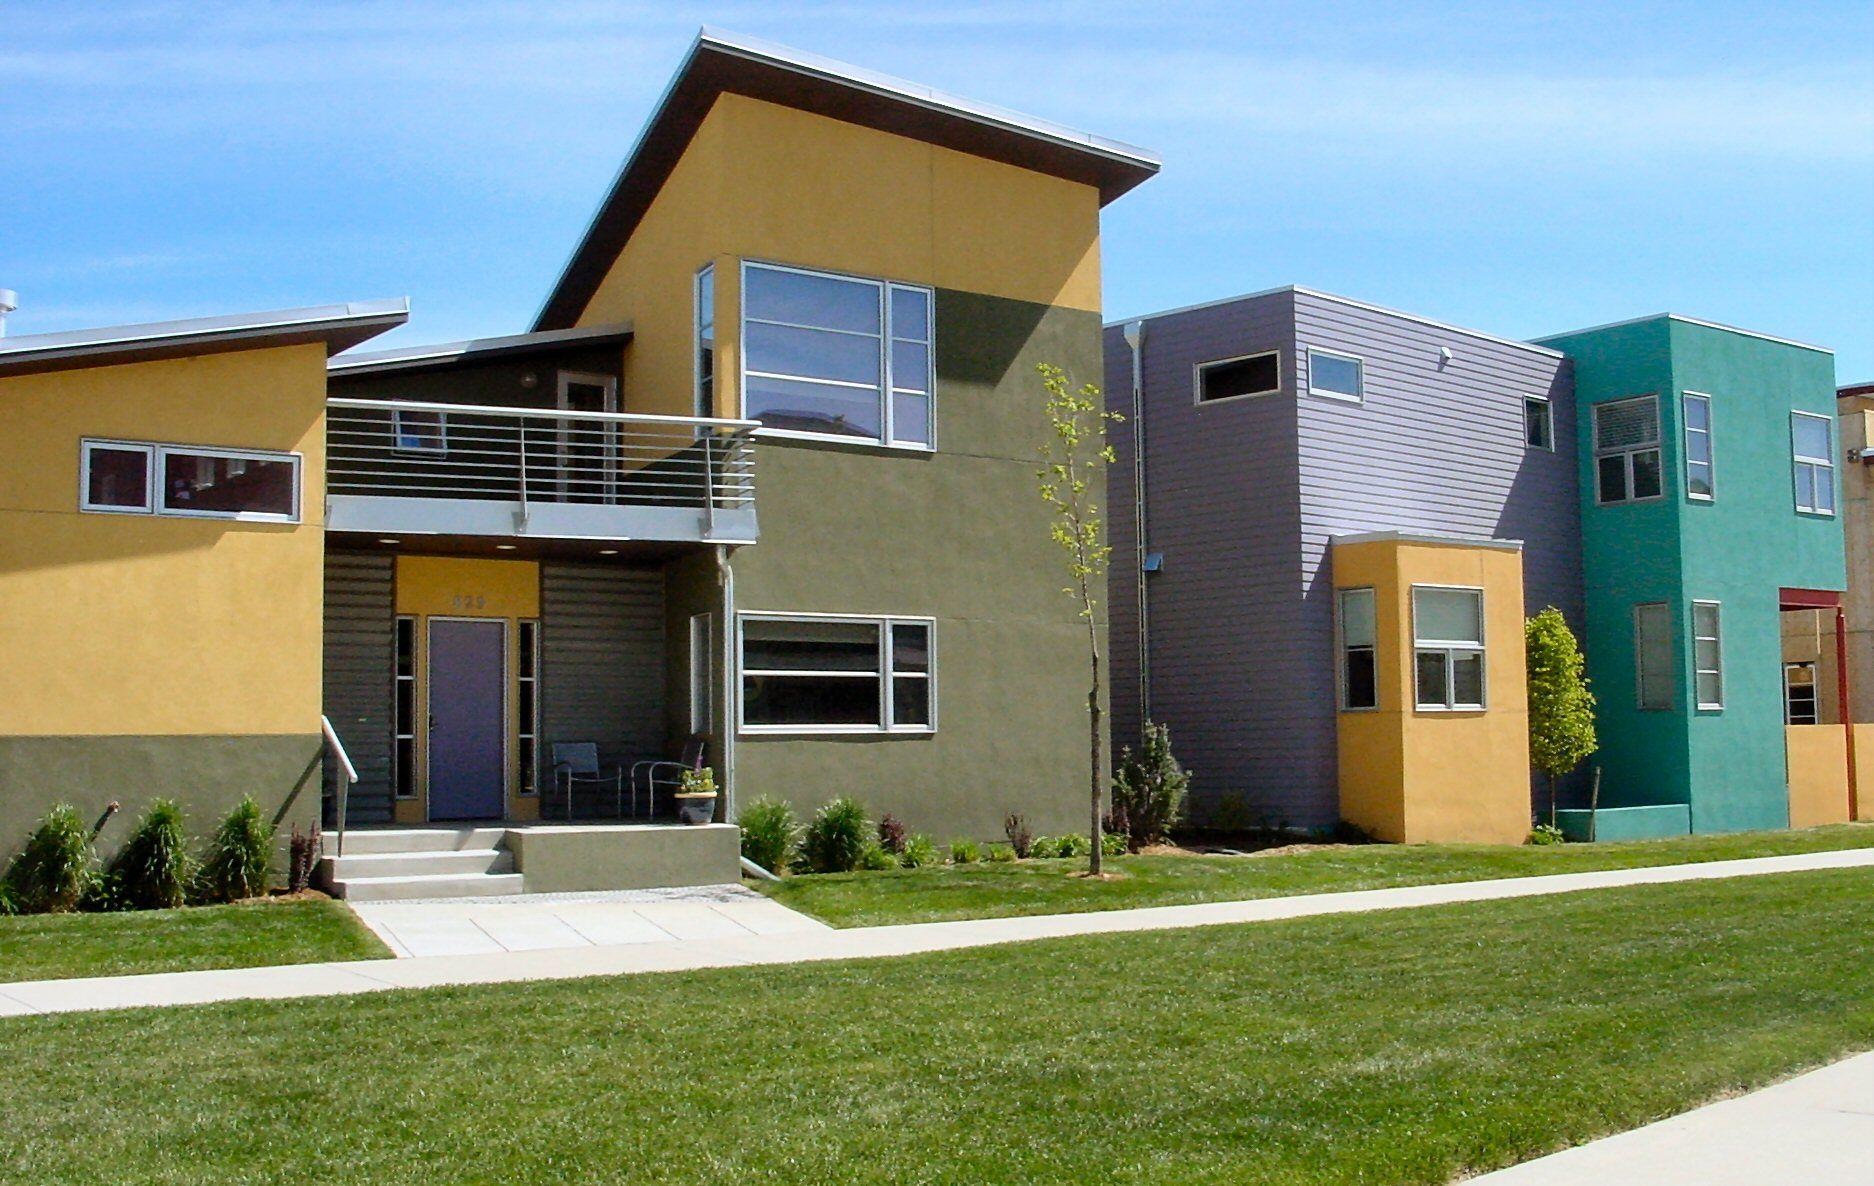 Modern houses characteristics of modern houses for Modern house characteristics